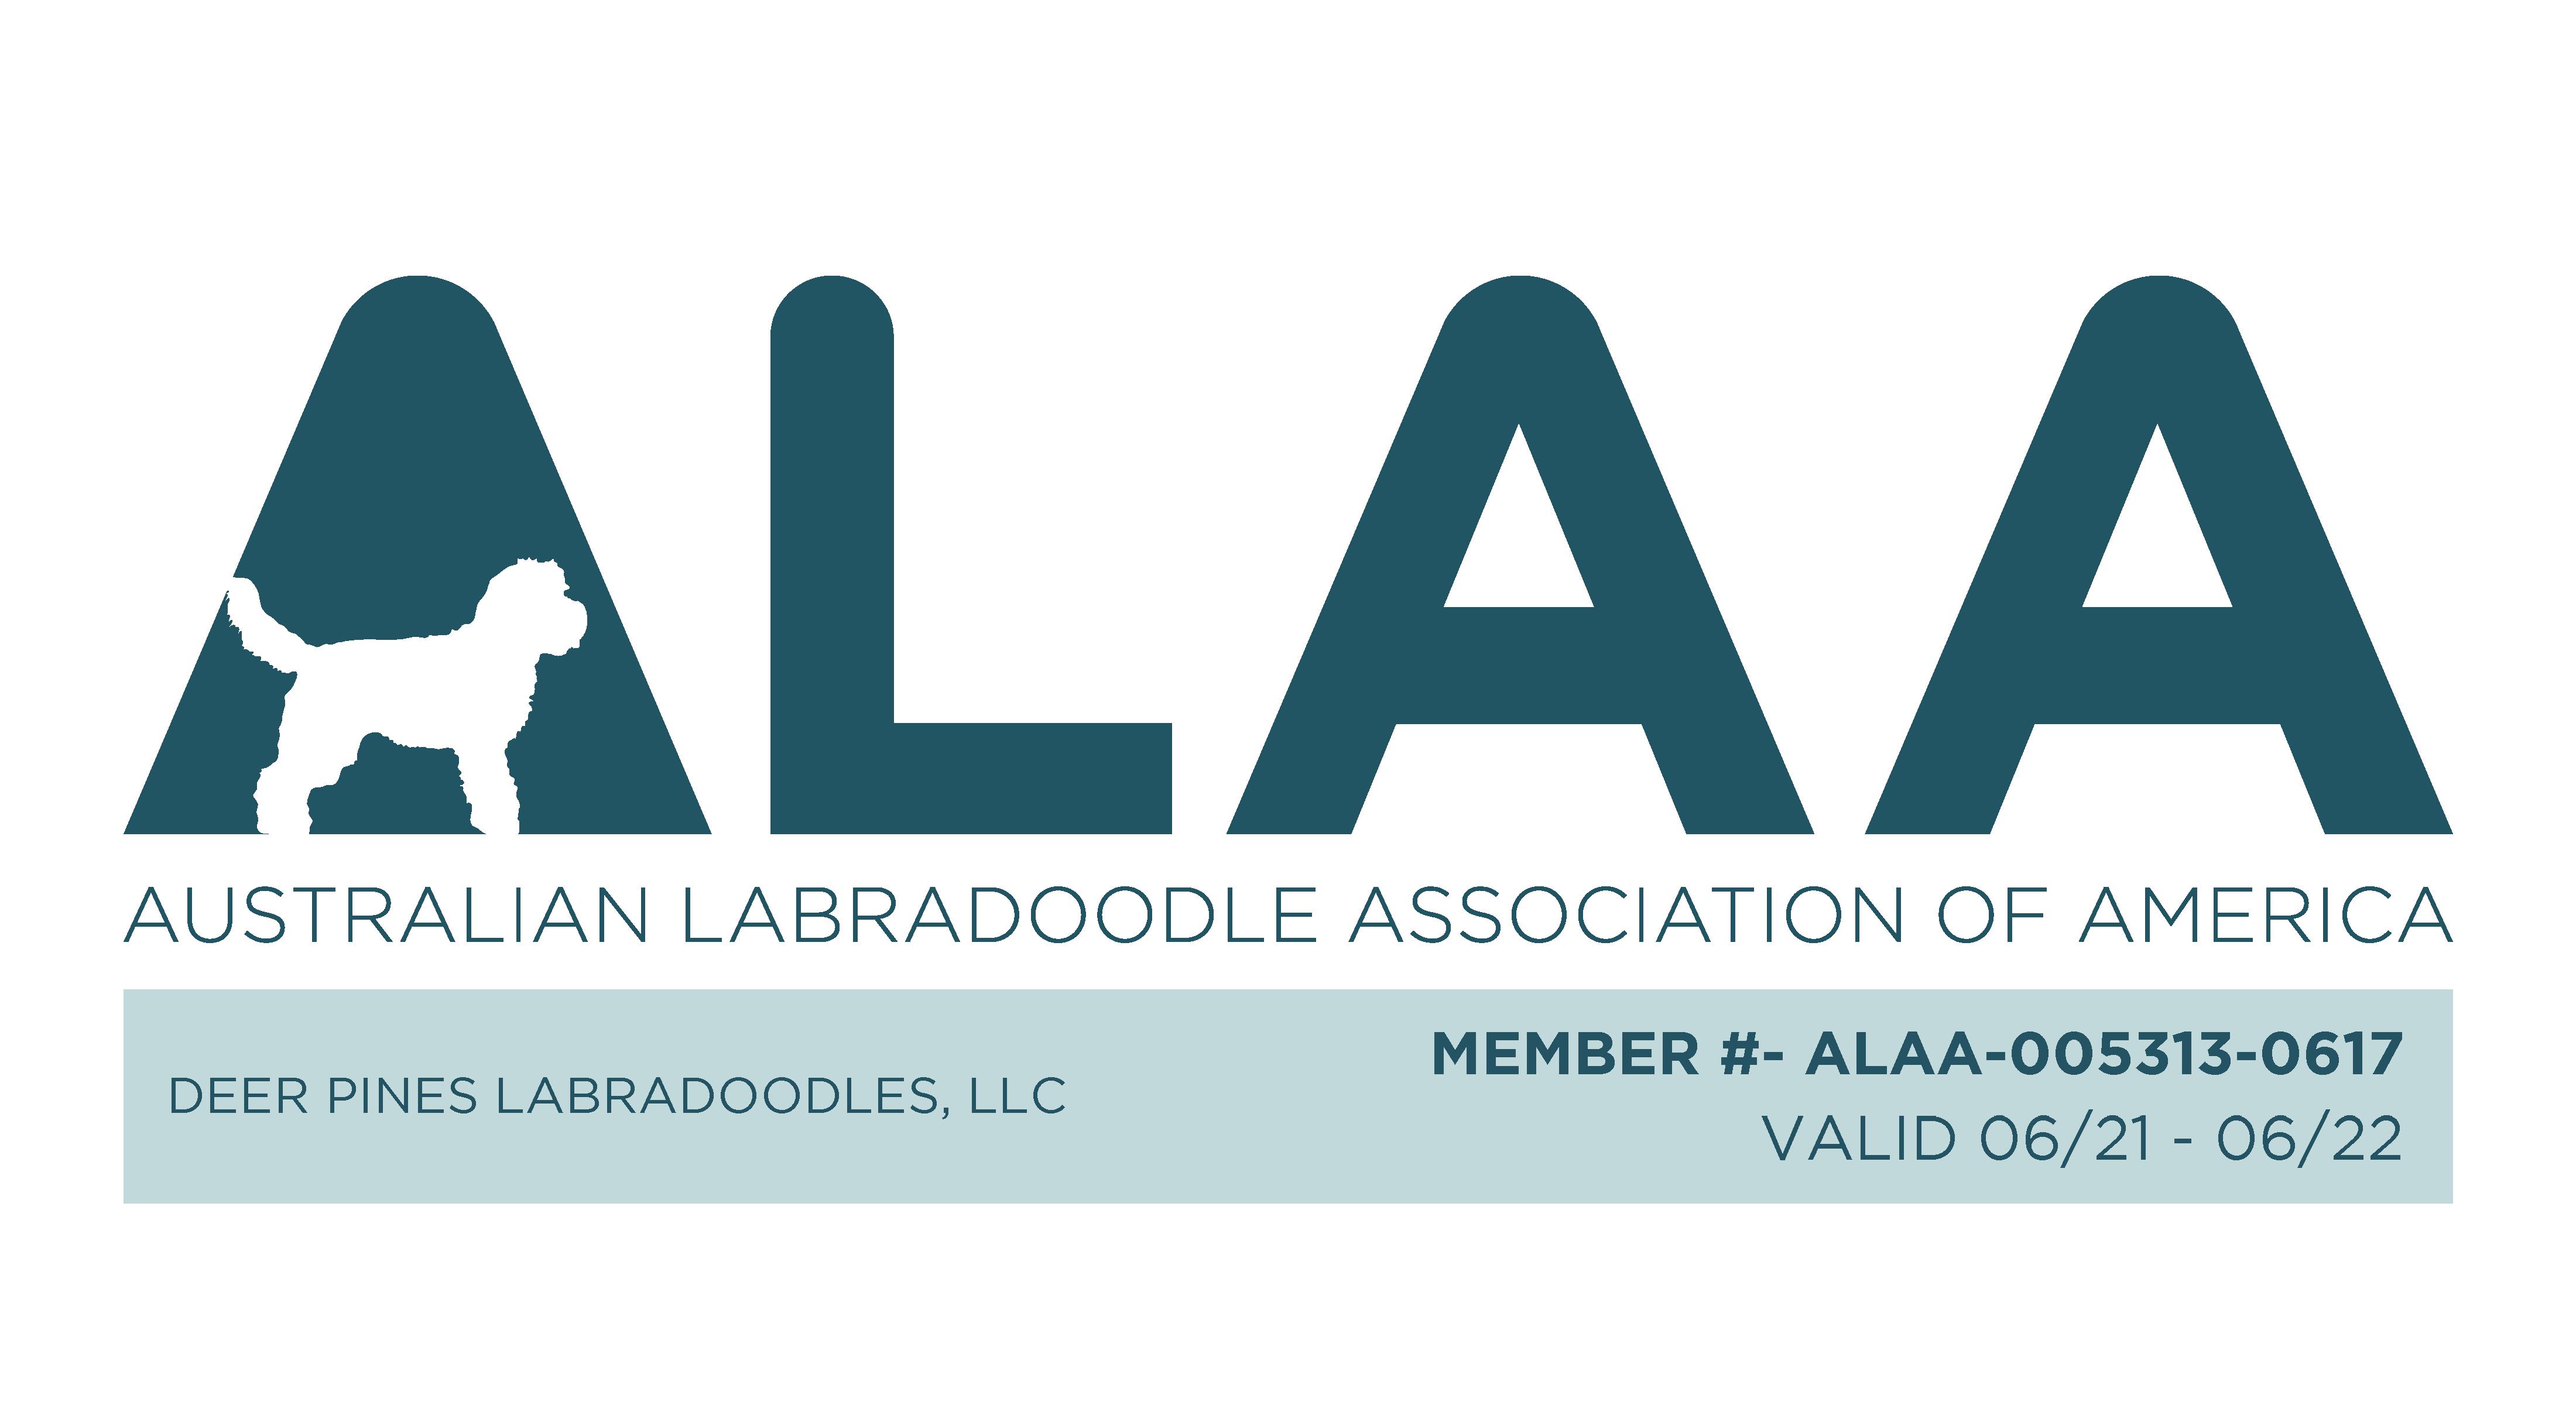 Australian Labradoodle Association of America